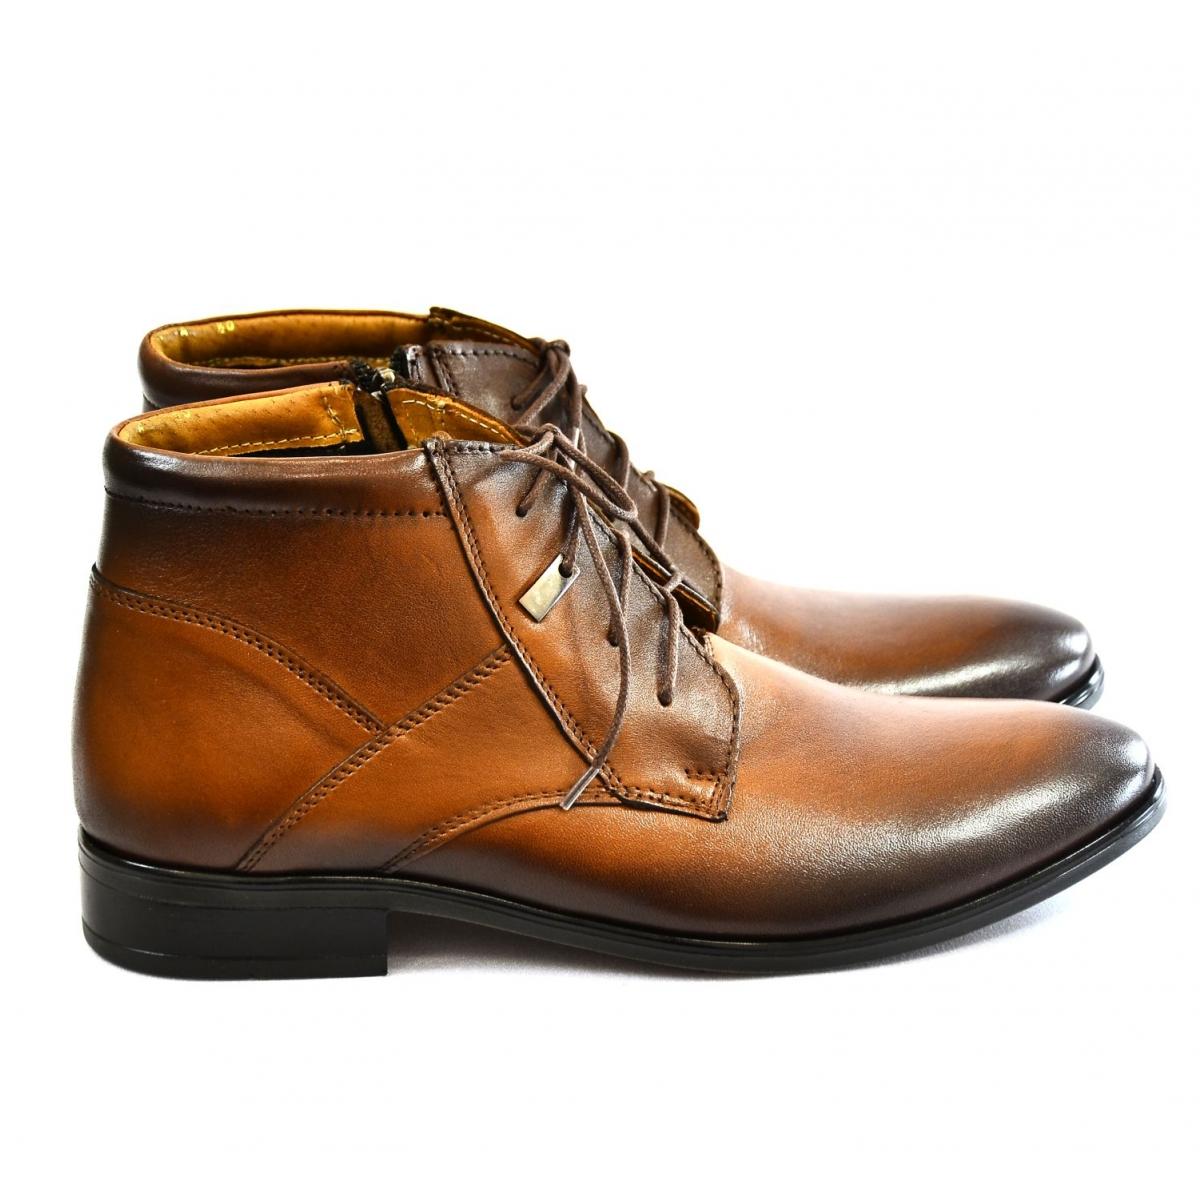 8ec4dcc9f3 Pánske hnedé kožené zimné topánky TYRION - 2